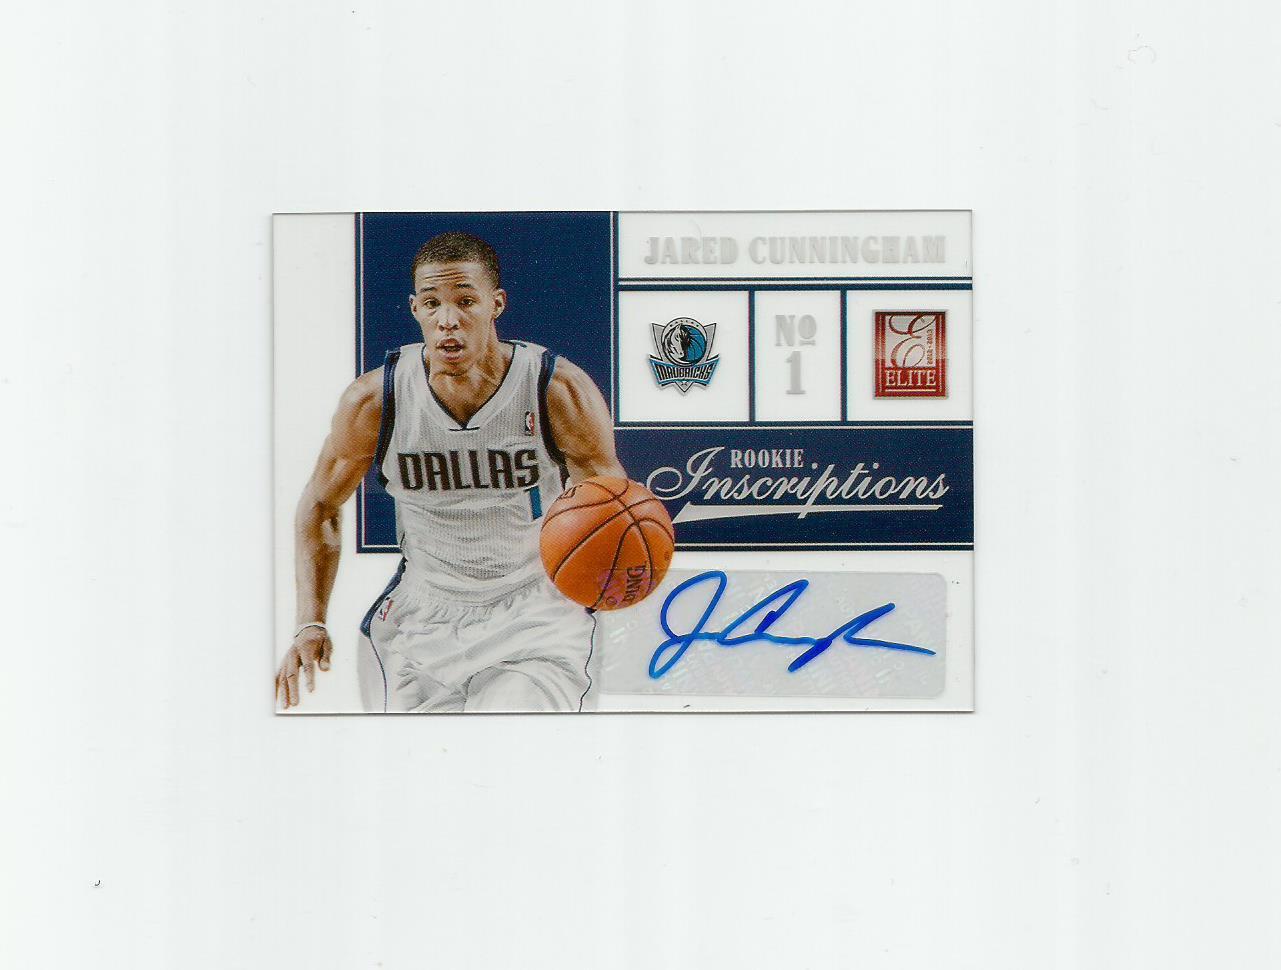 Jared Cunningham 2012-13 Panini Elite Rookie Inscriptions #24 Dallas Mavericks/Sacramento Kings